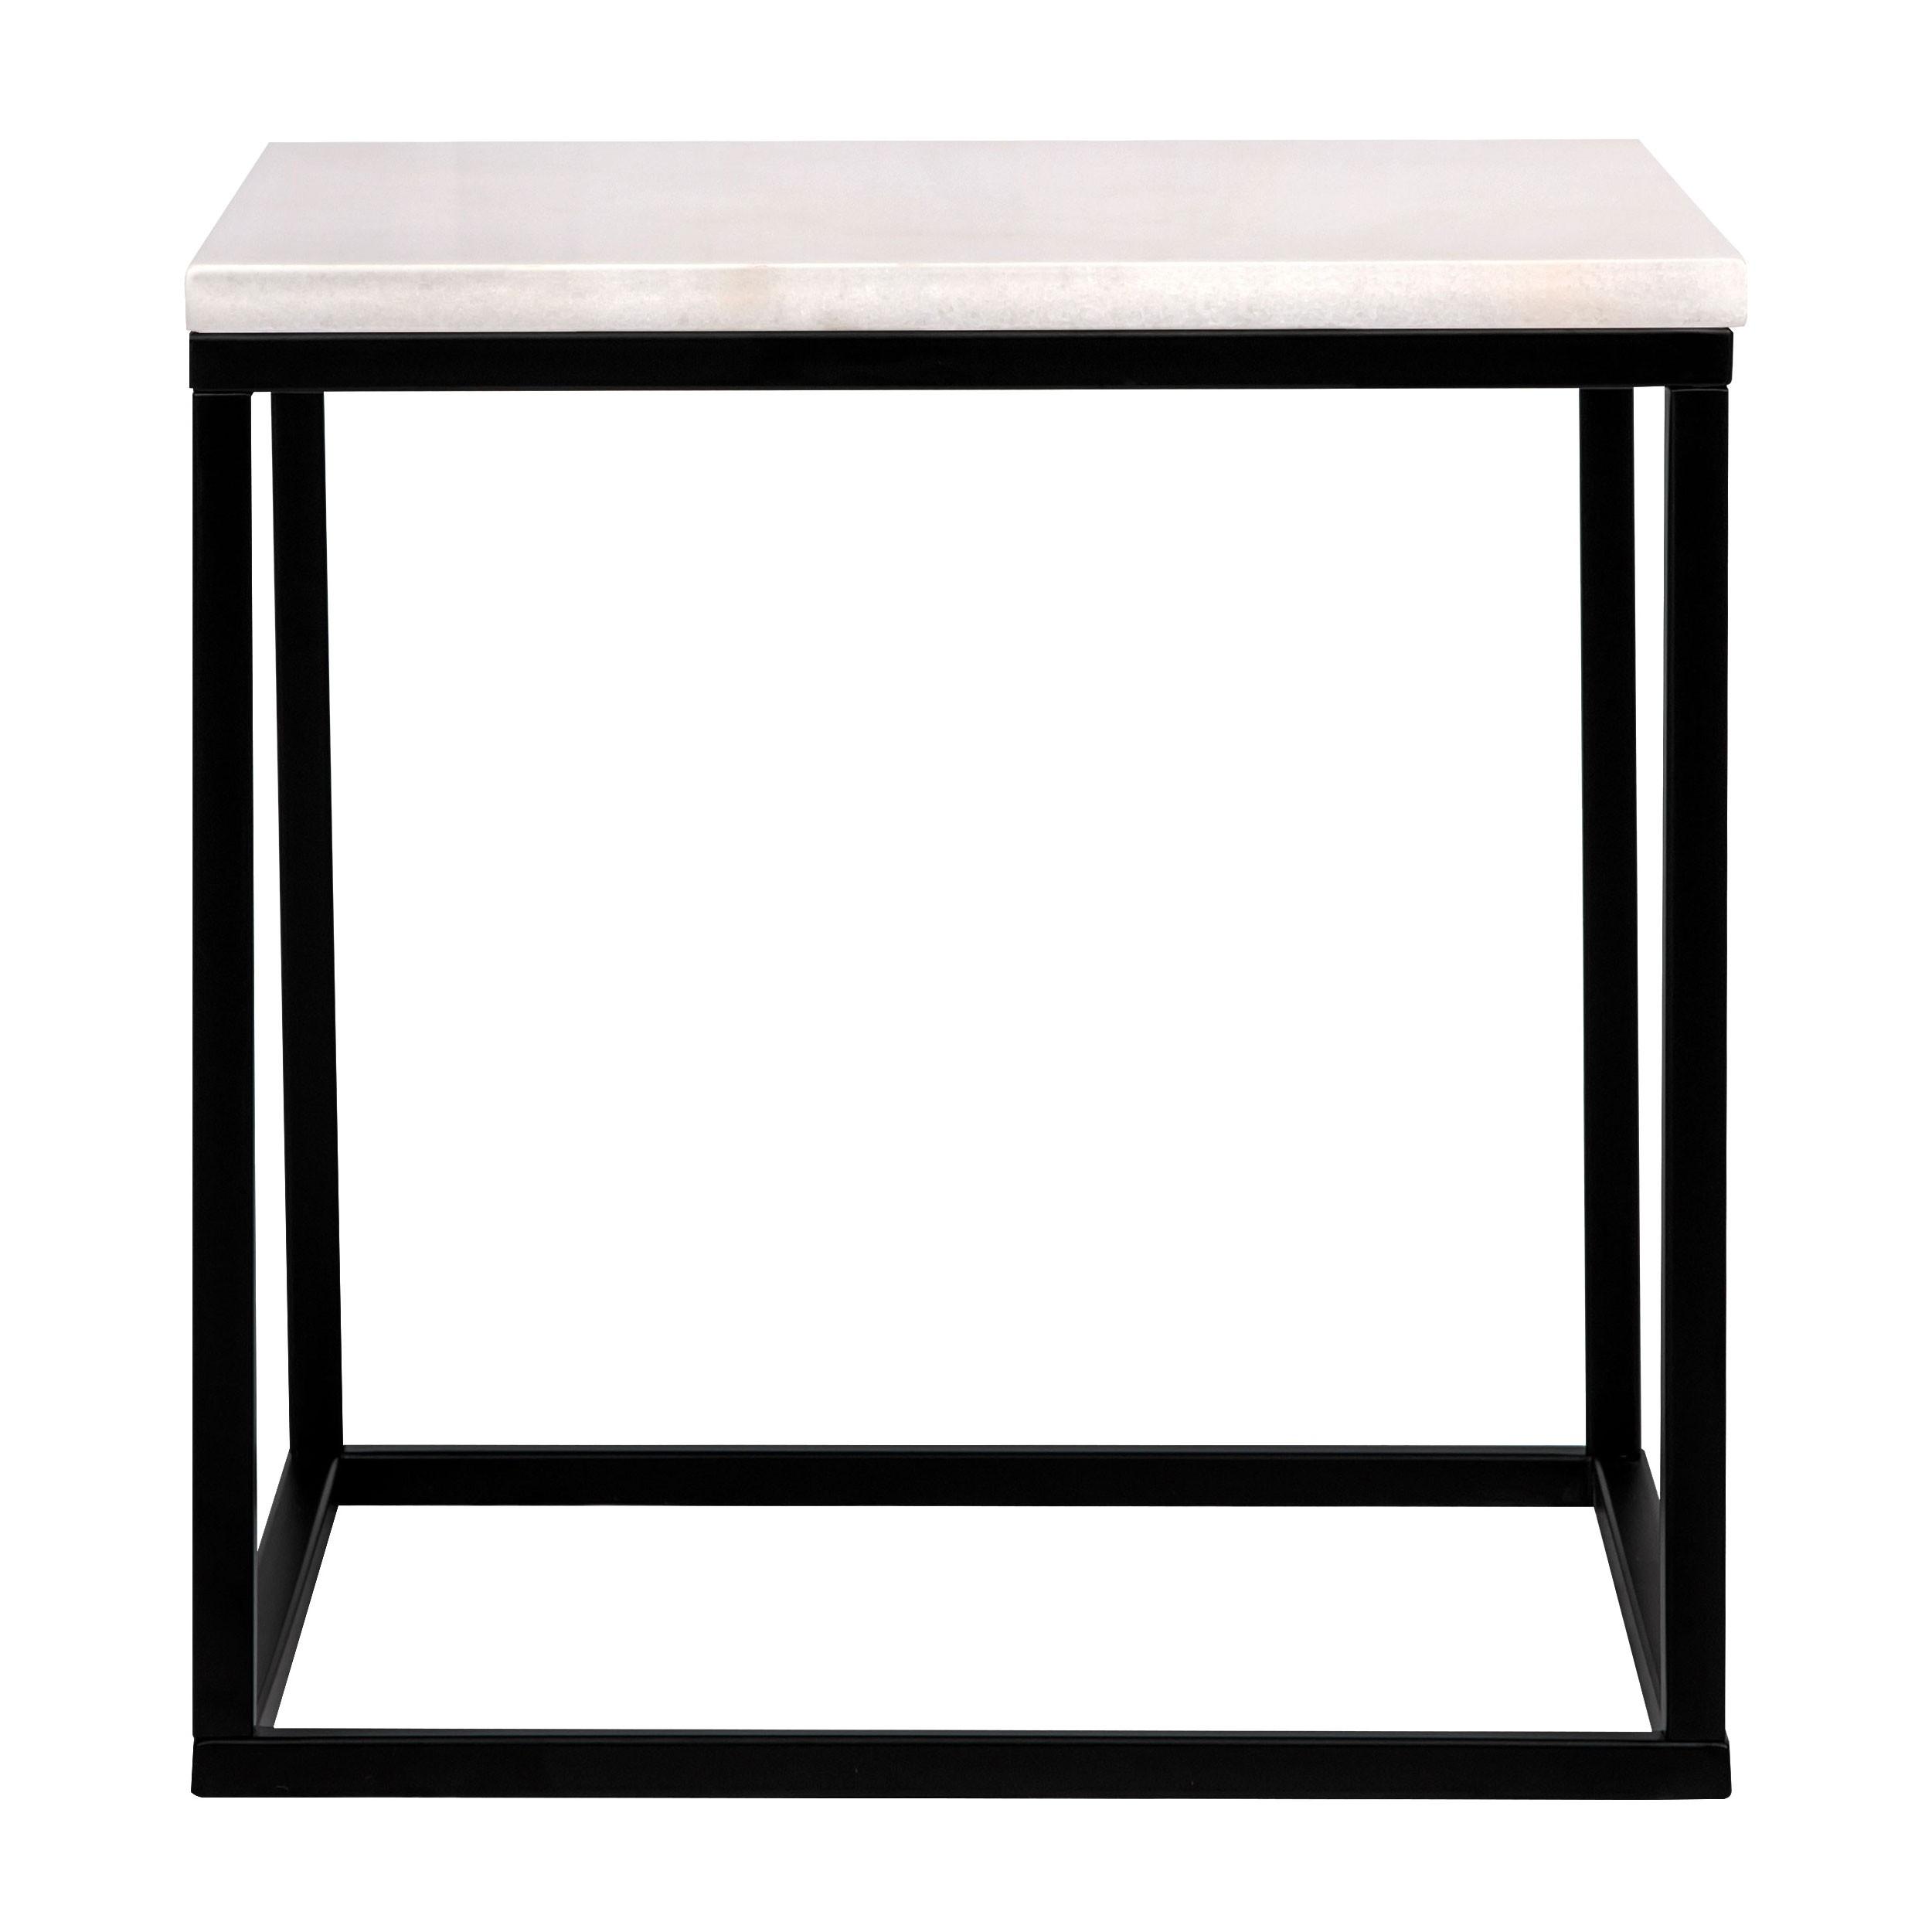 table d 39 appoint carr e dagmar marbre blanche testez nos tables d 39 appoint carr es dagmar marbre. Black Bedroom Furniture Sets. Home Design Ideas